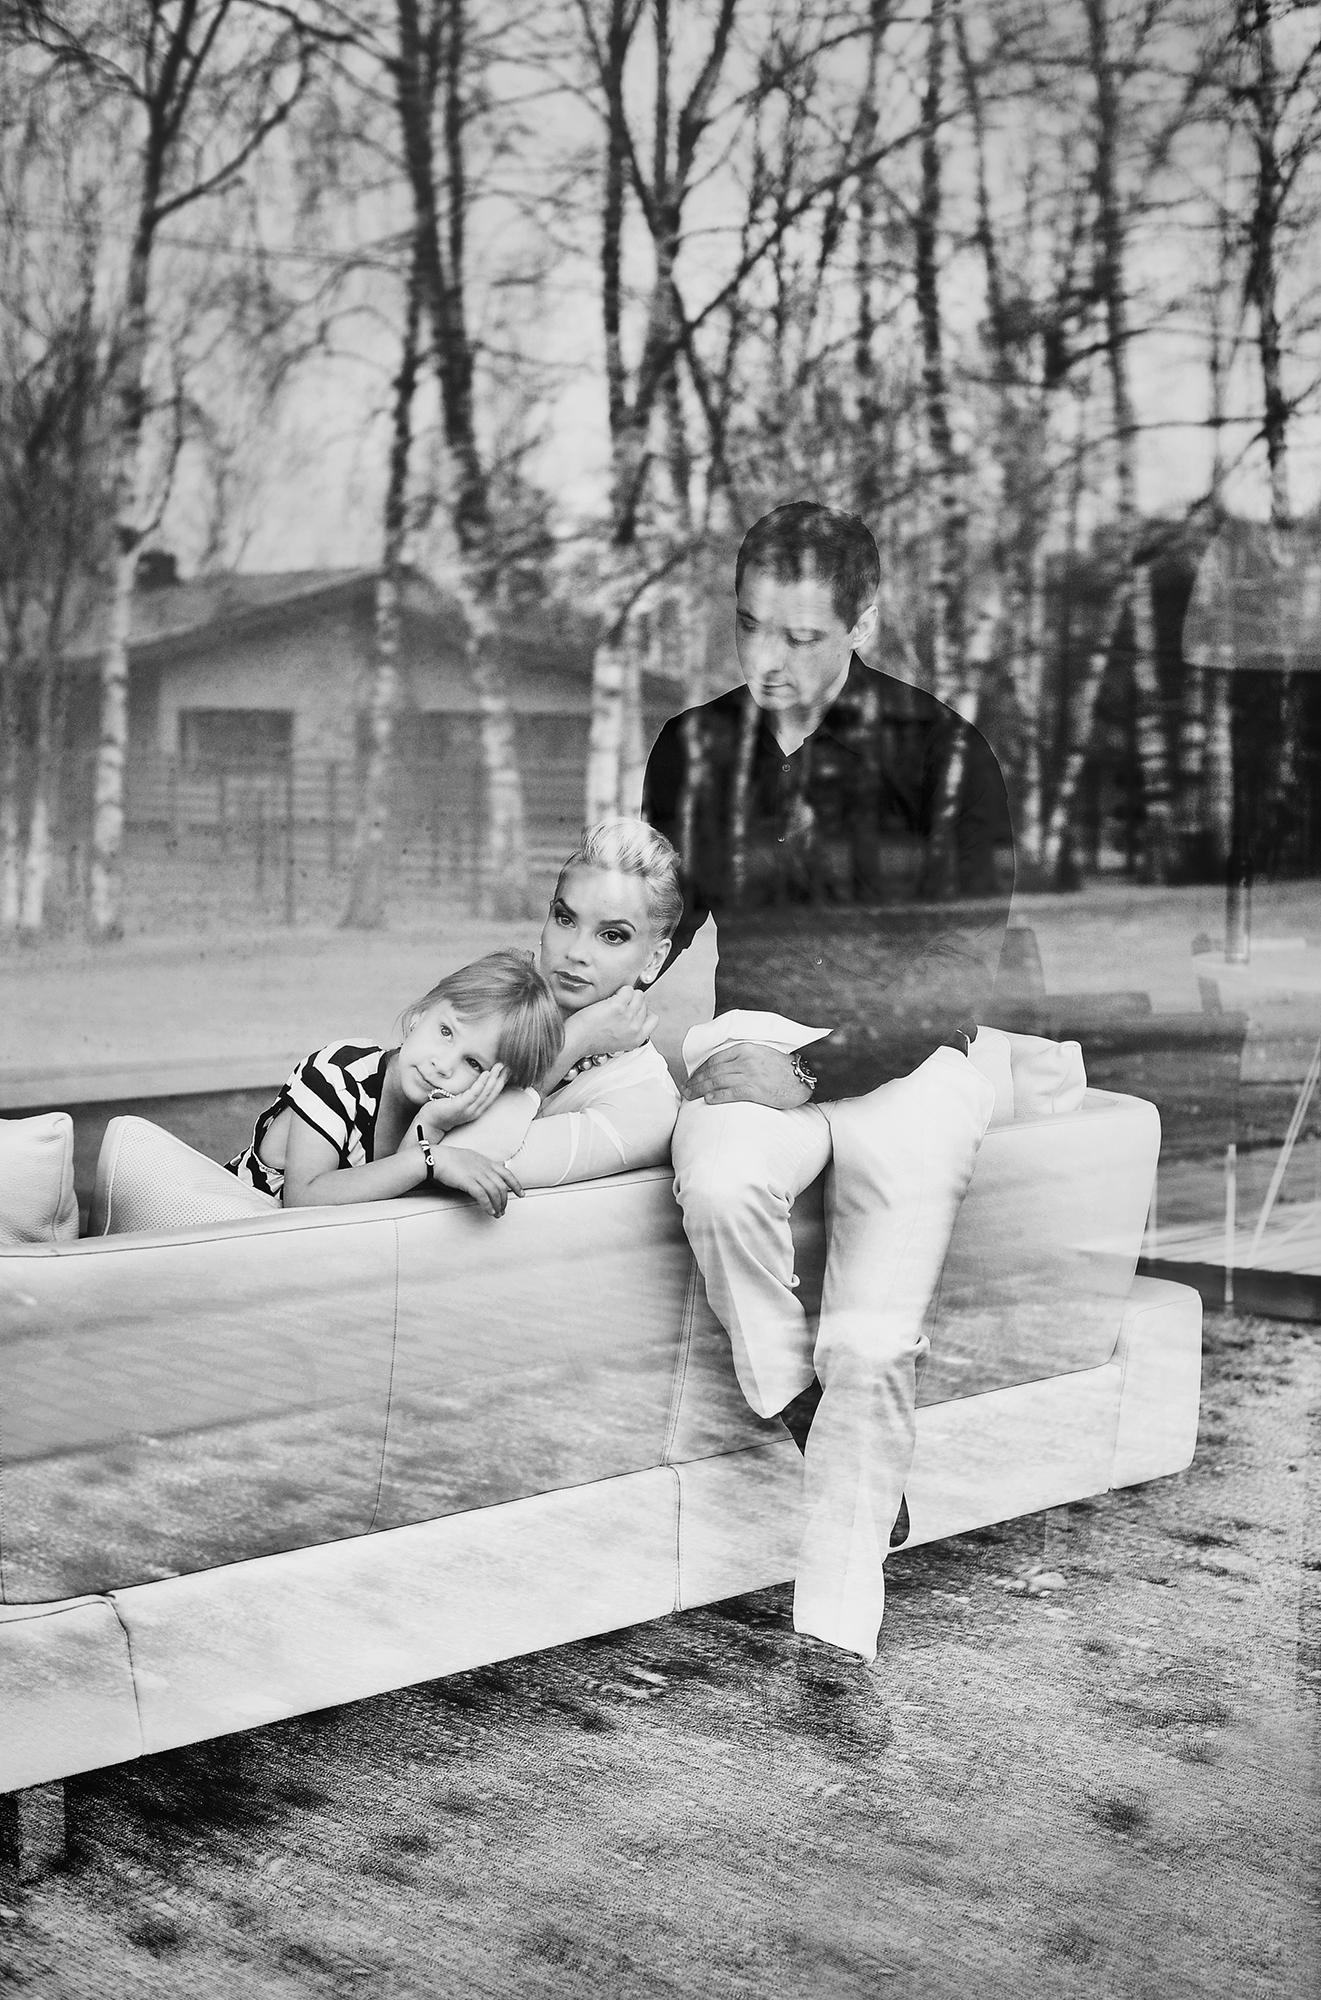 Lina_Ruskyte-Lukoseviciene_portrait avant garde_February_LT_15